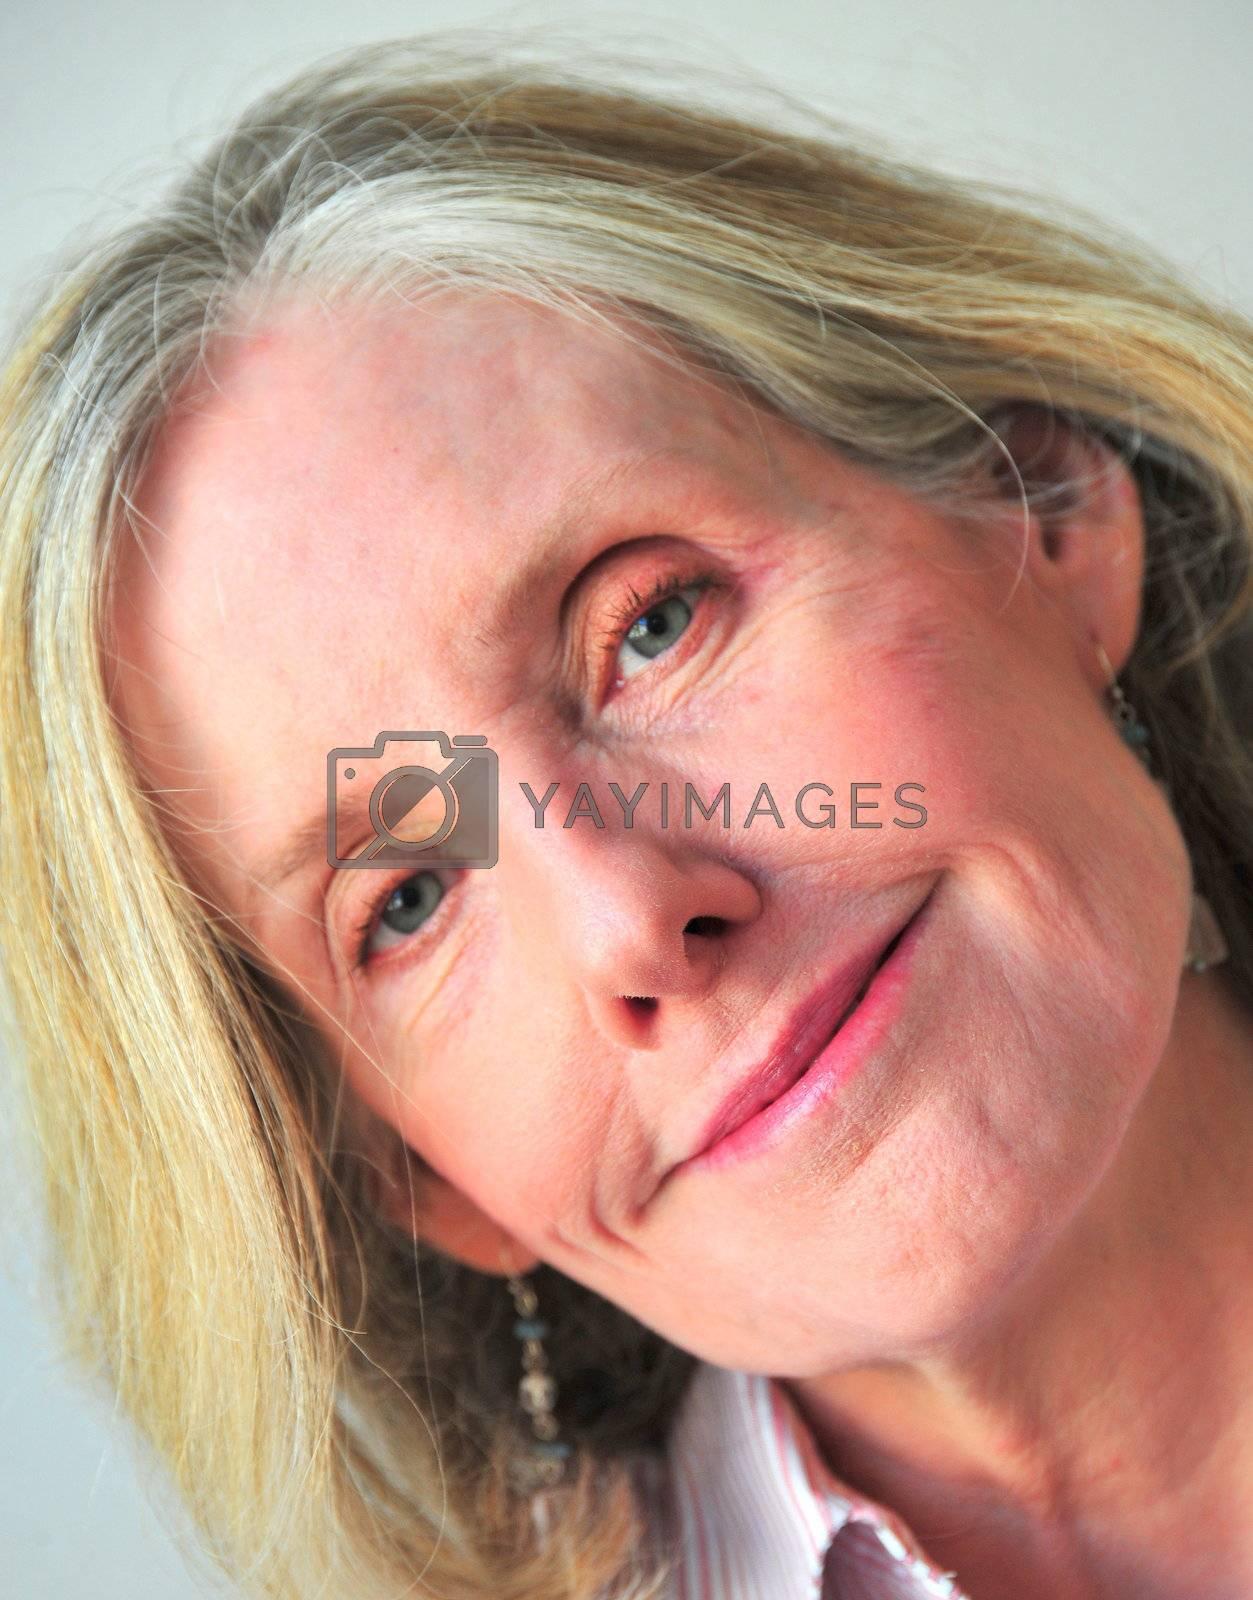 Norwegian Female Beauty by oscarcwilliams